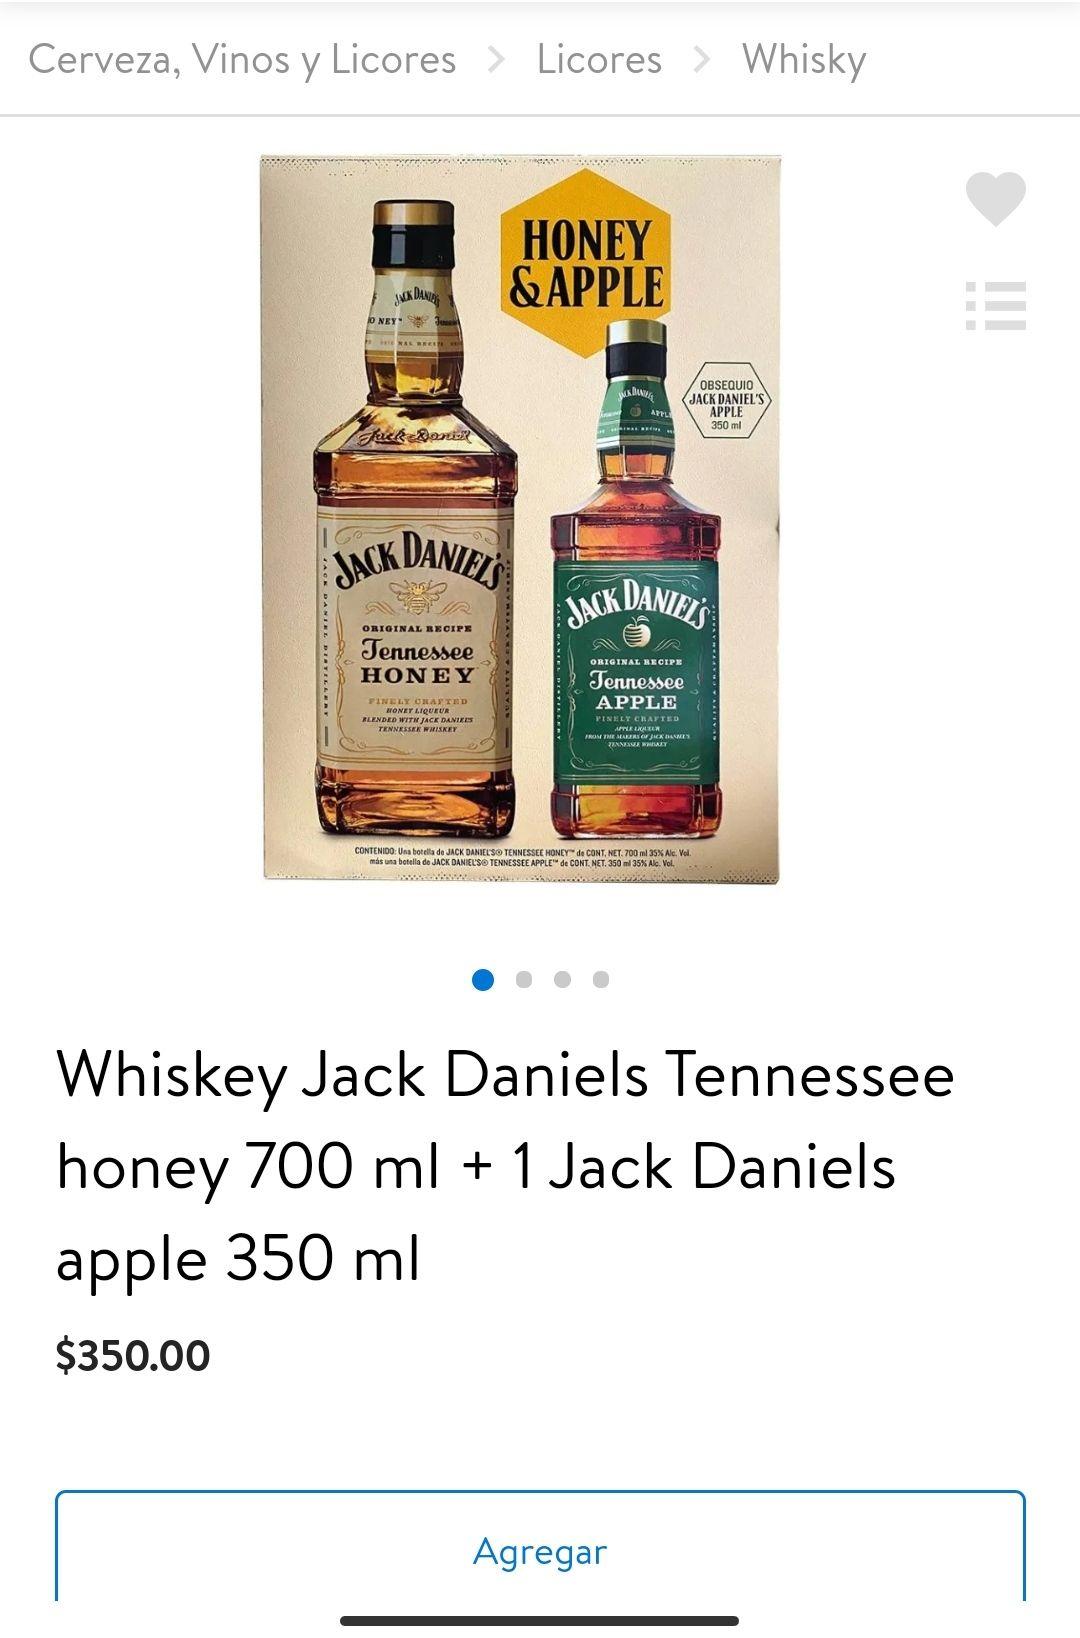 Walmart: Whiskey Jack Daniels Tennessee honey 700 ml + 1 Jack Daniels apple 350 ml